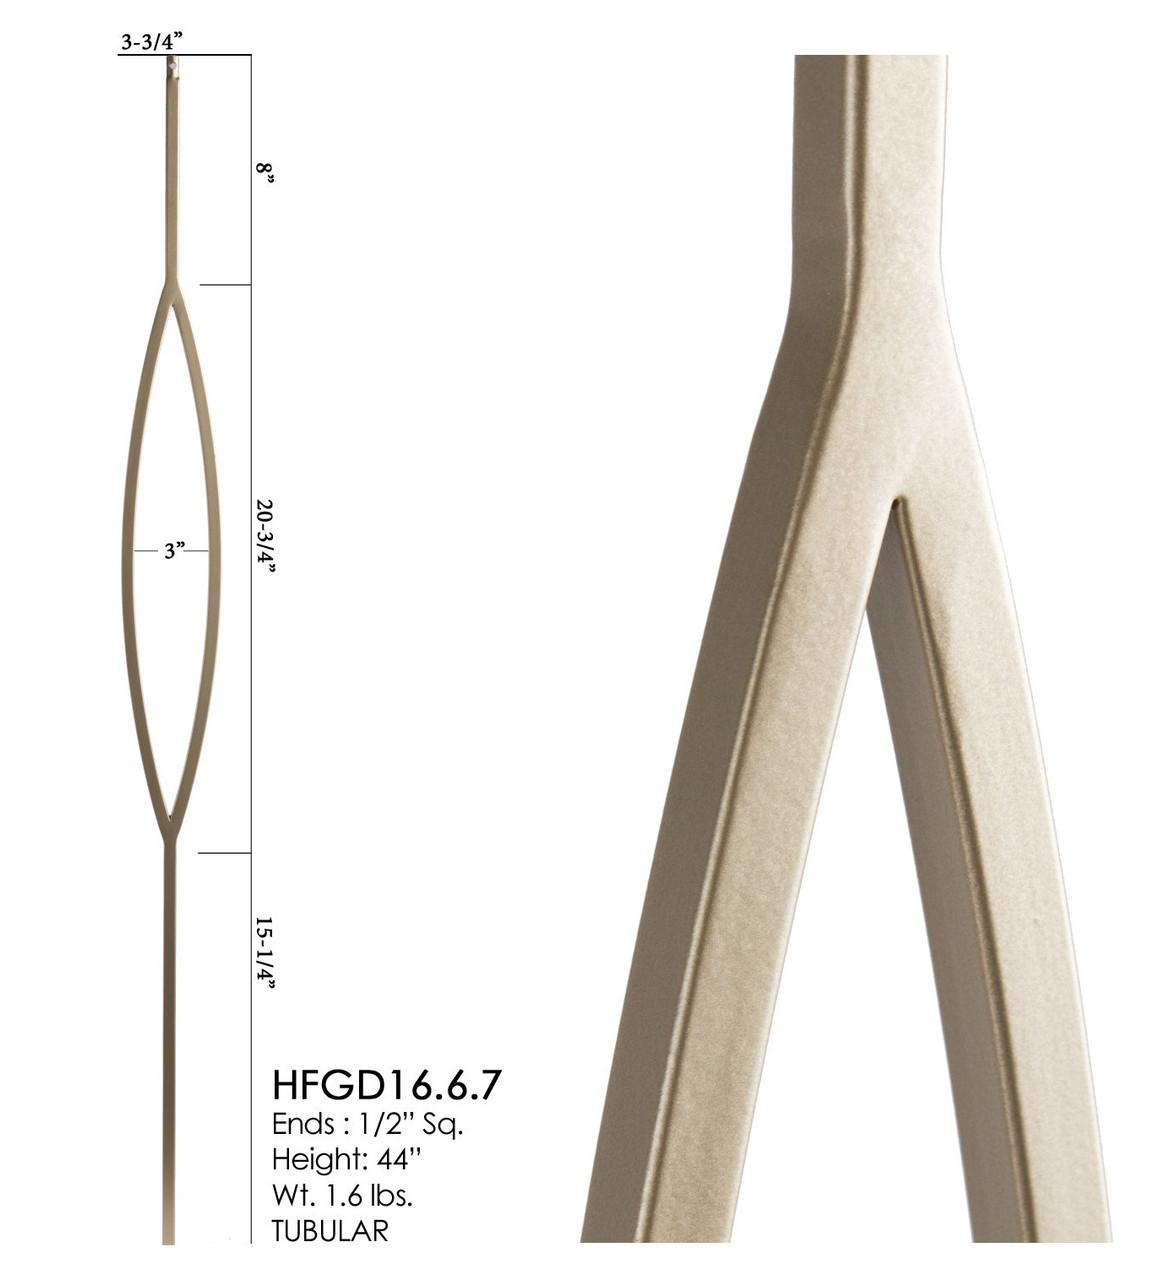 HF16.6.7 Oval Tubular Steel Baluster, Dorado Gold